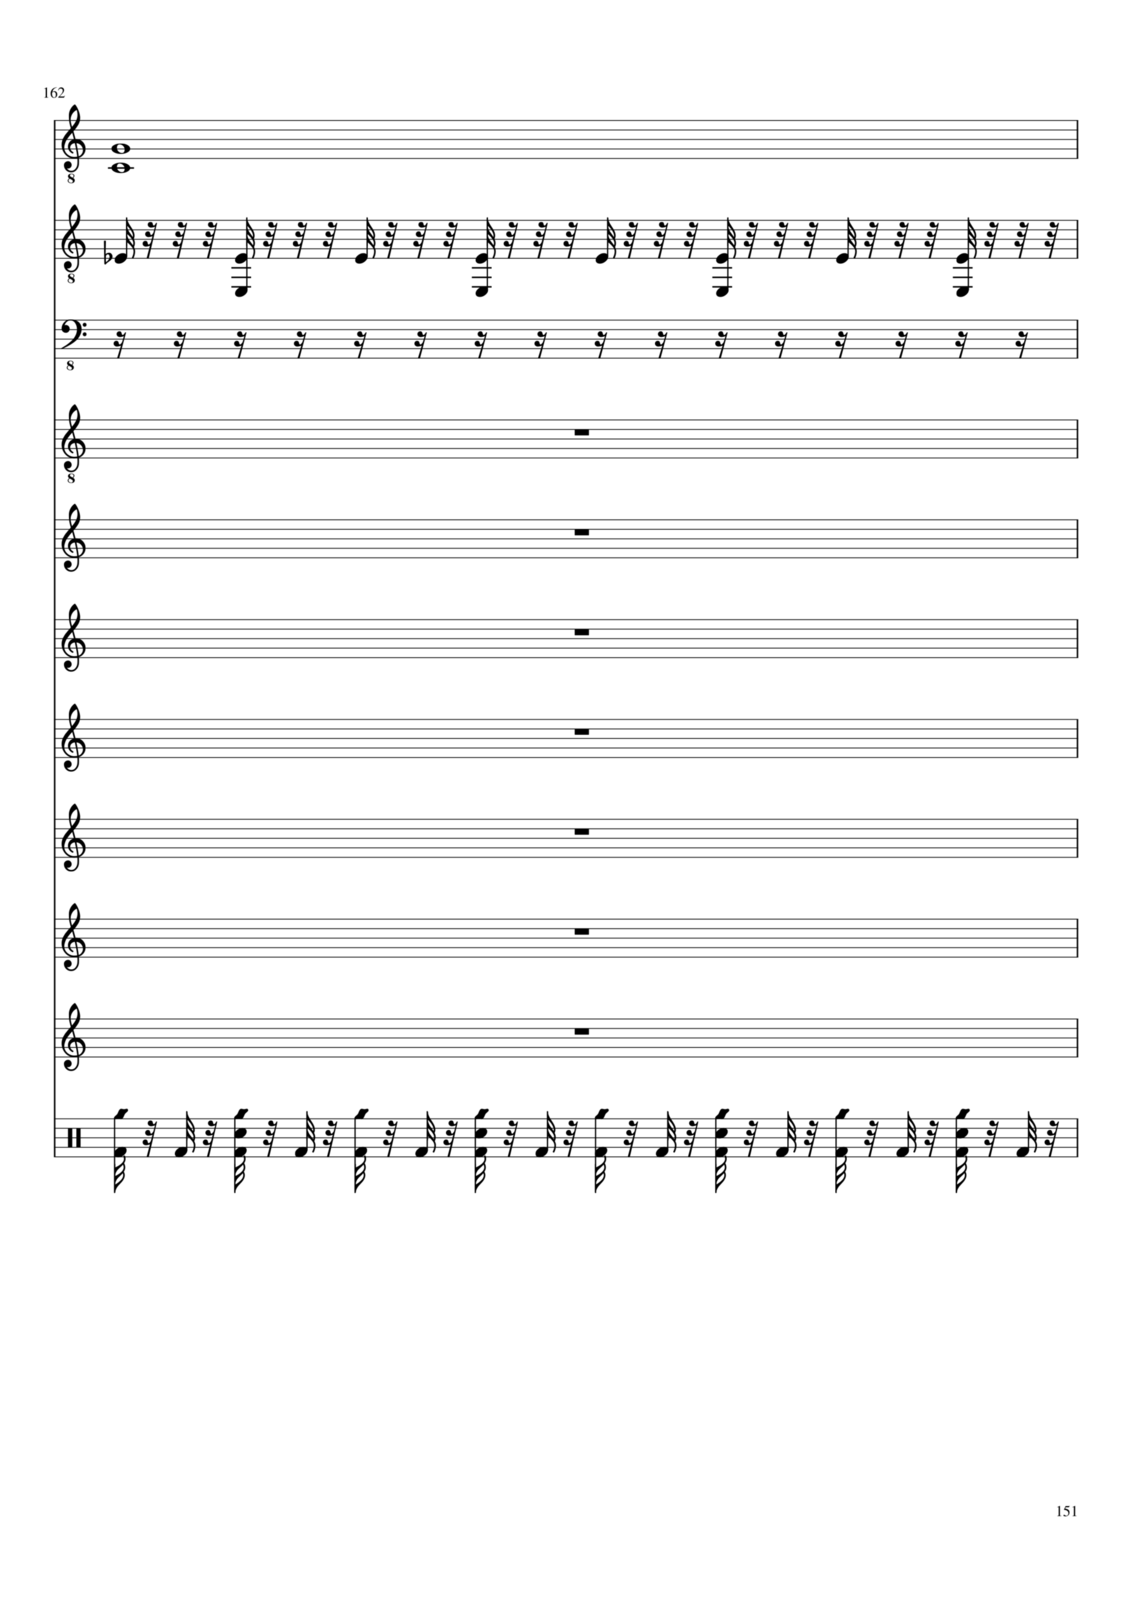 Belyiy sokol slide, Image 151